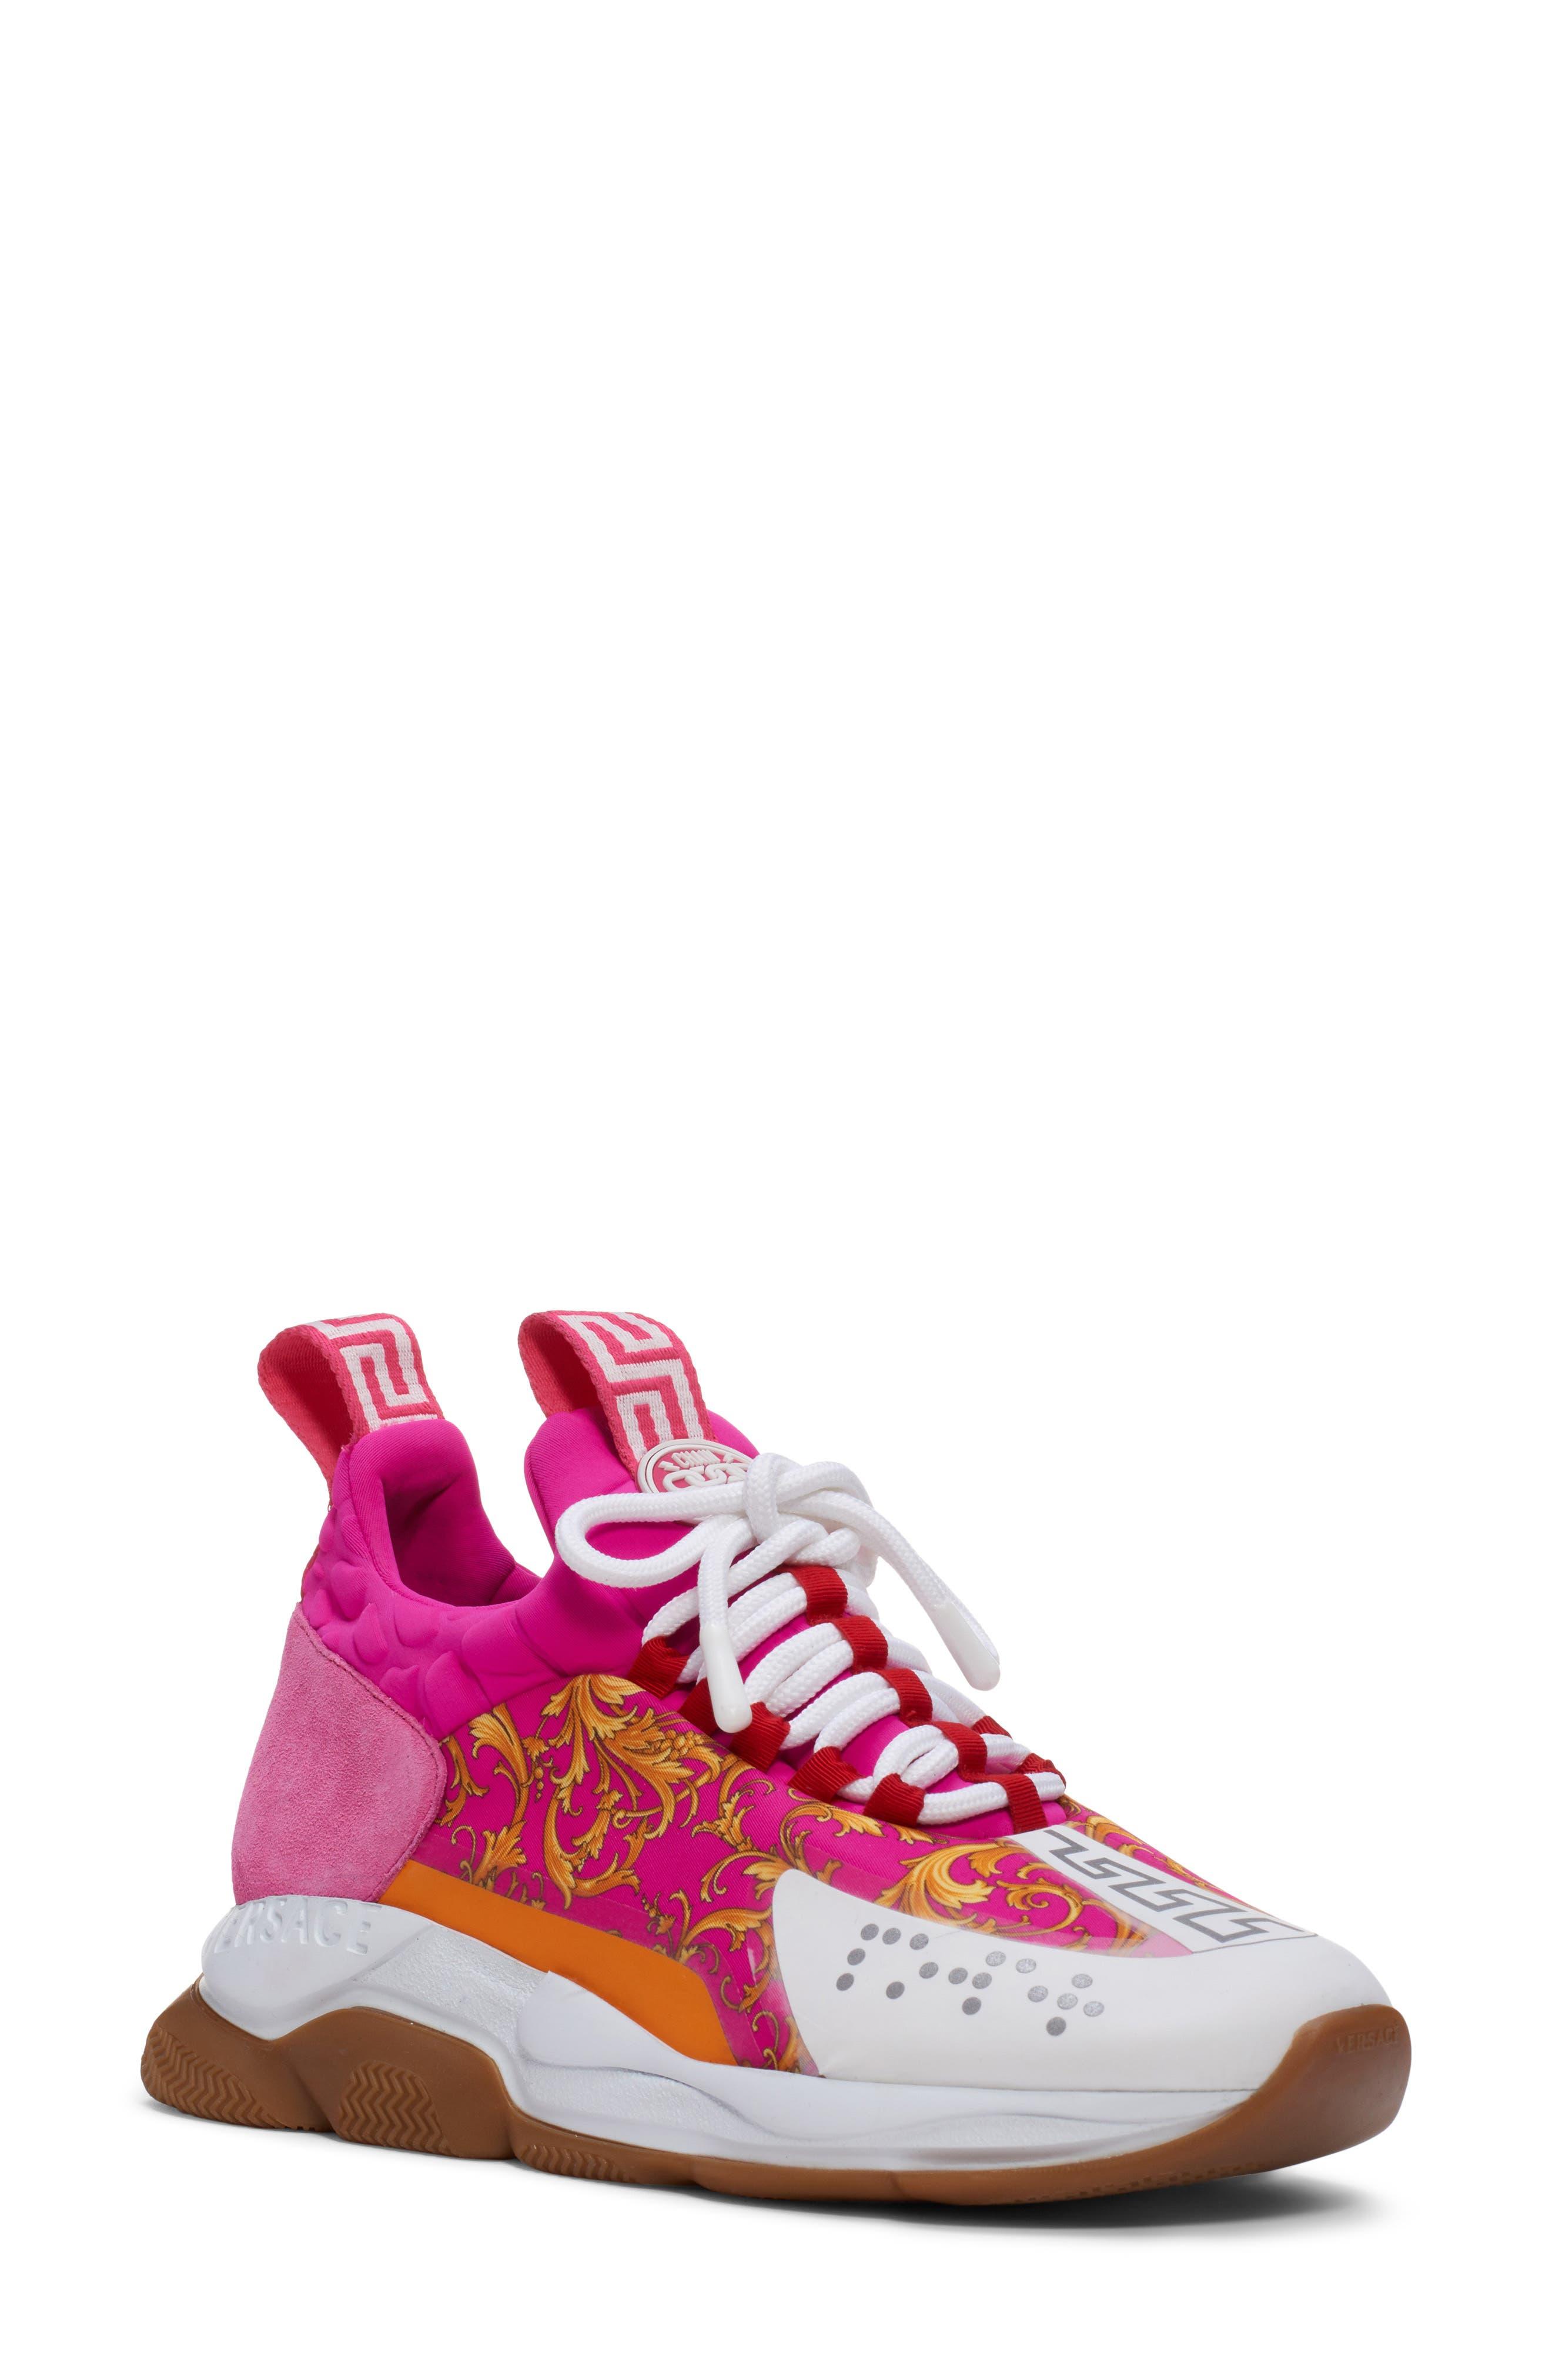 versace shoes nordstrom, OFF 72%,Buy!